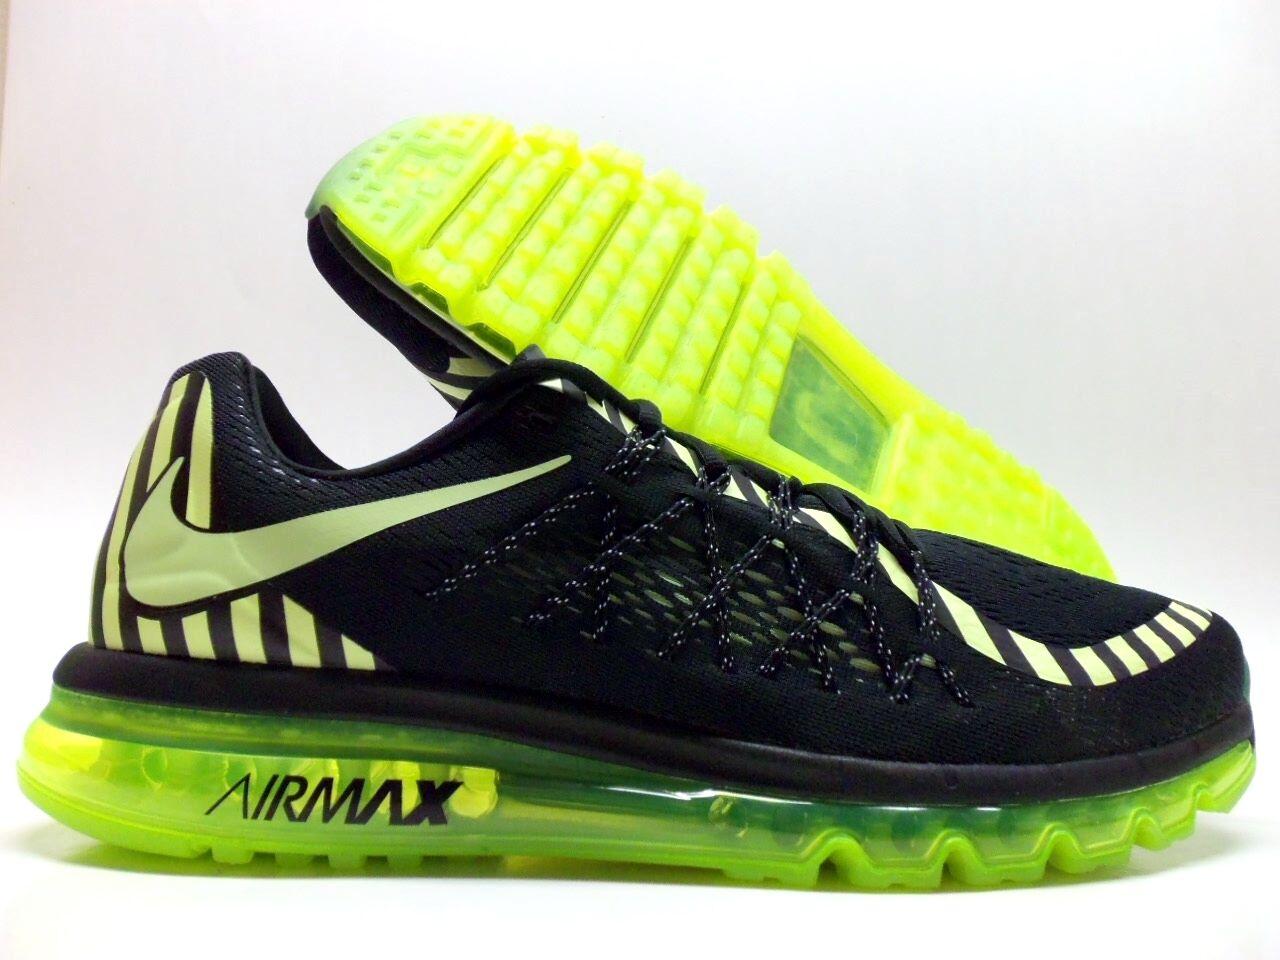 Men s Nike Air Max 2015 Nr Anniversary Running Shoes 746687-014 ... 5e1e20dc2